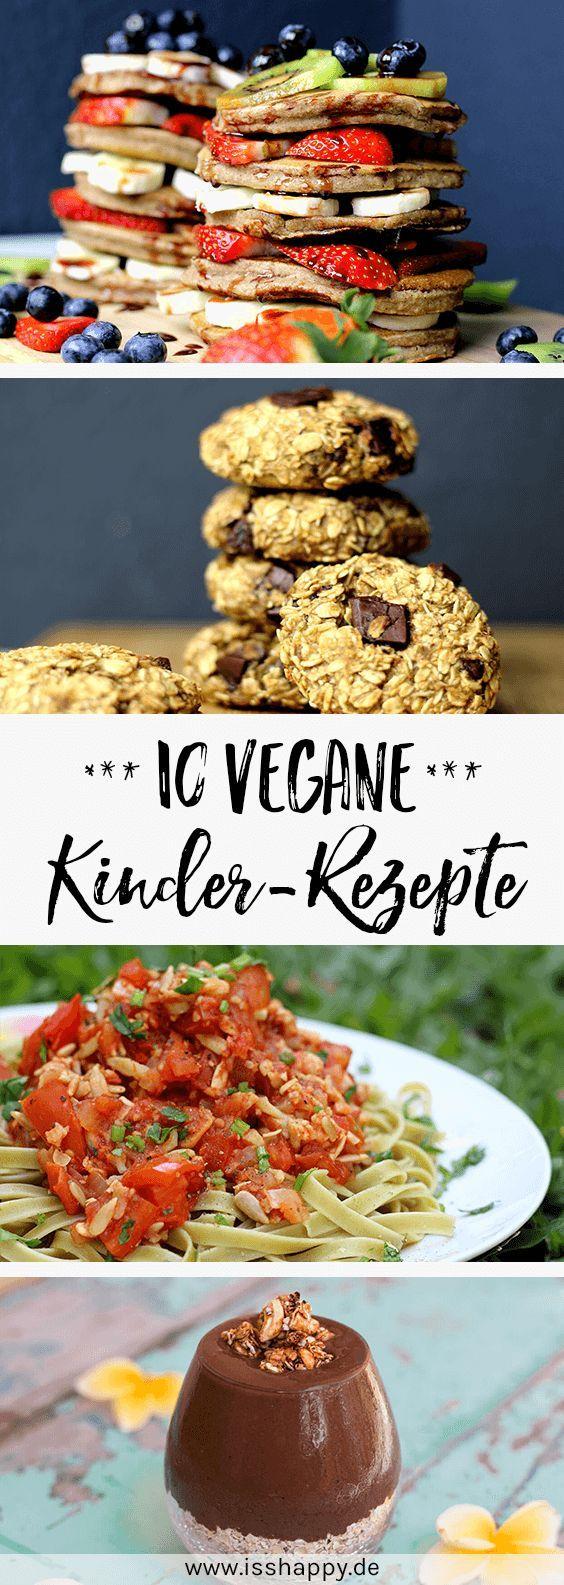 Vegane Rezepte Fur Kinder 10 Leckere Inspirationen Fur Den Alltag Vegane Rezepte Fur Kinder Vegane Rezepte Und Milchfreie Rezepte